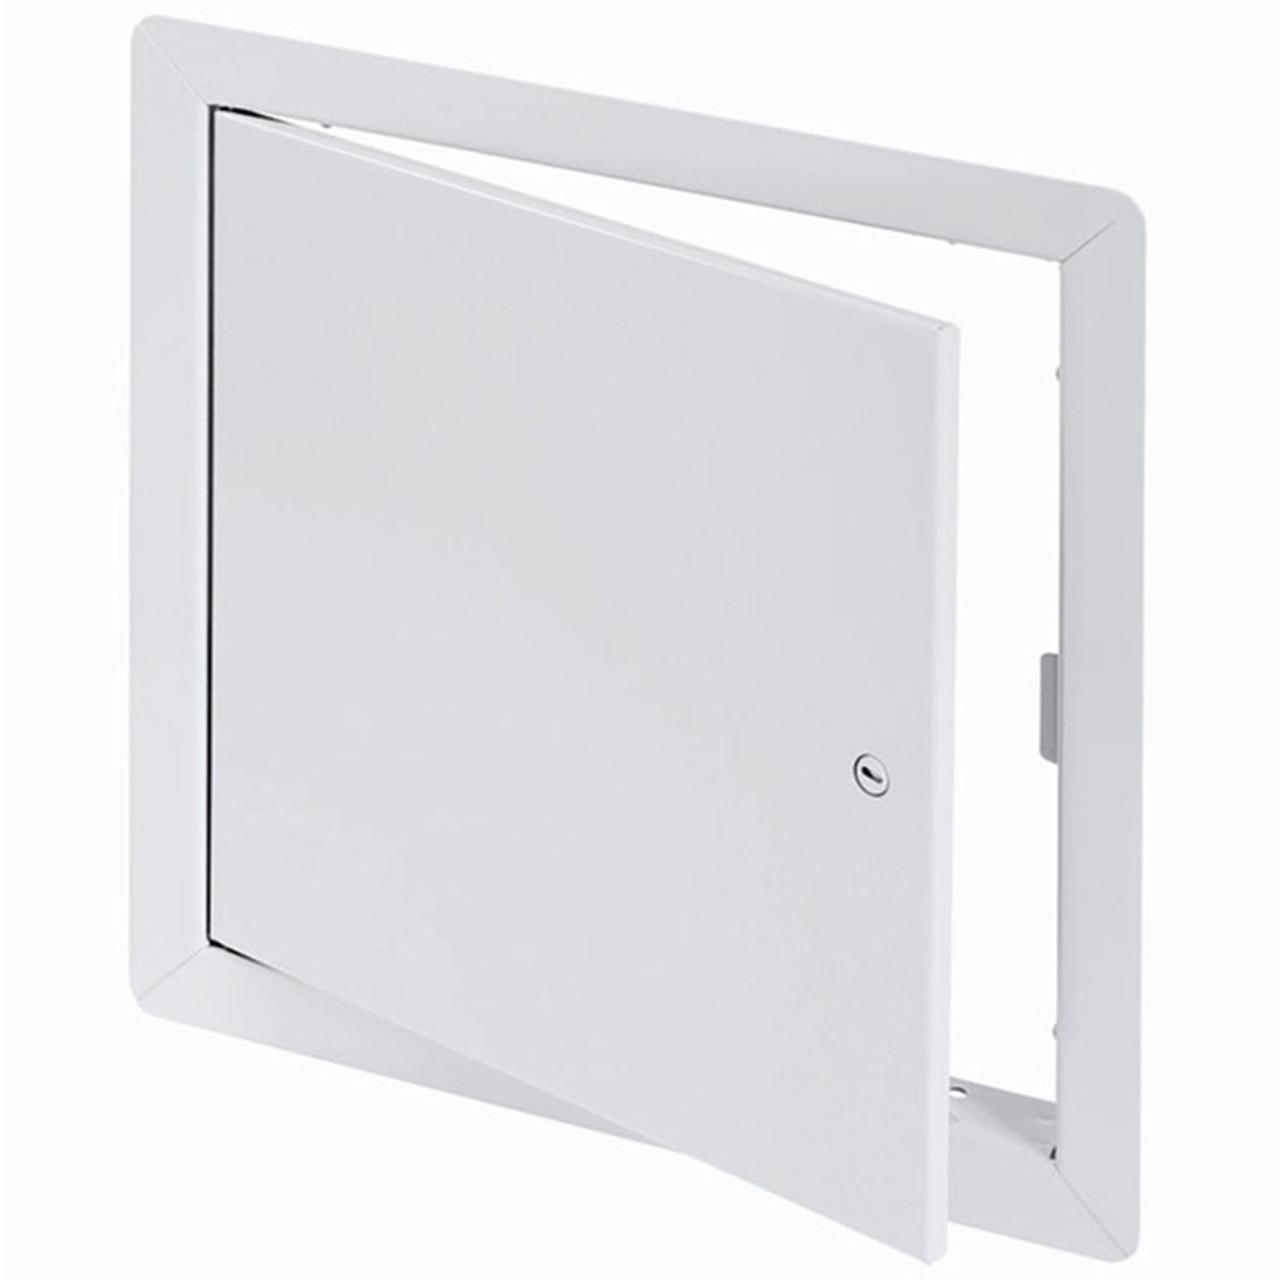 Cendrex AHD General Purpose Access Door 24 x 36